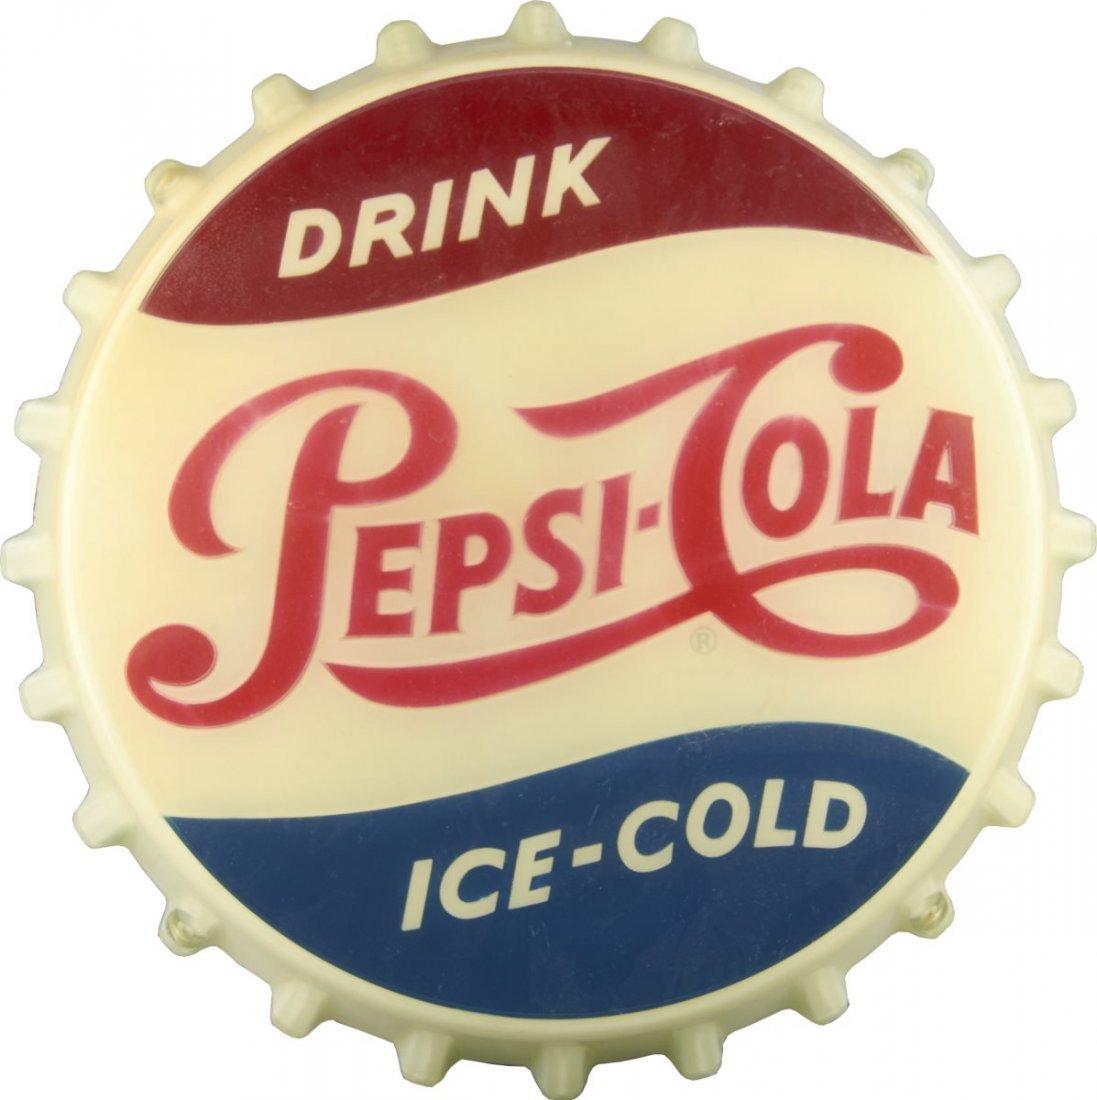 Pepsi-Cola Light Up Bottle Cap Sign